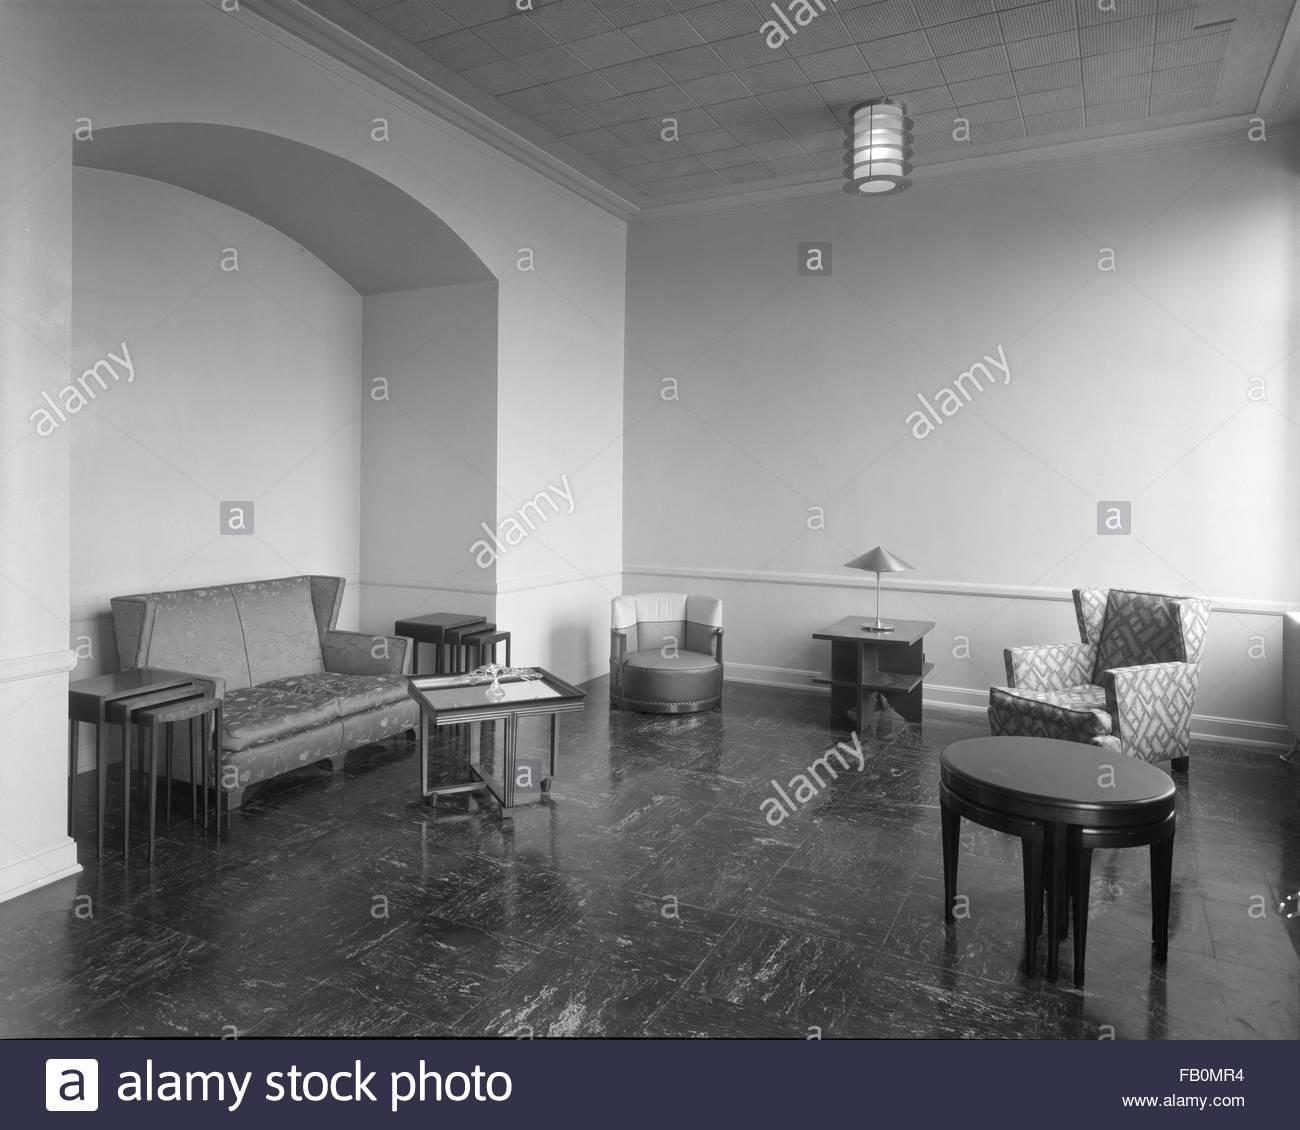 Interior, lounge. Jewel Tea Company in Barrington (Ill.), 1930 Apr. 12. - Stock Image